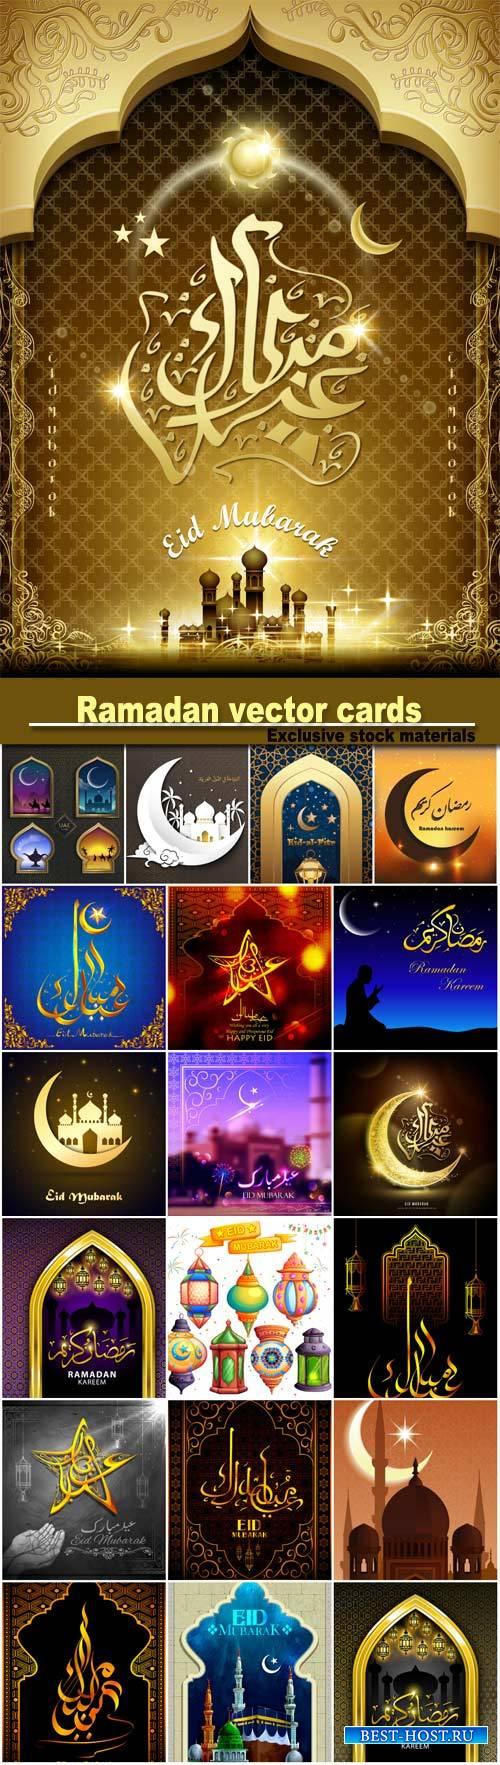 Ramadan cards vector